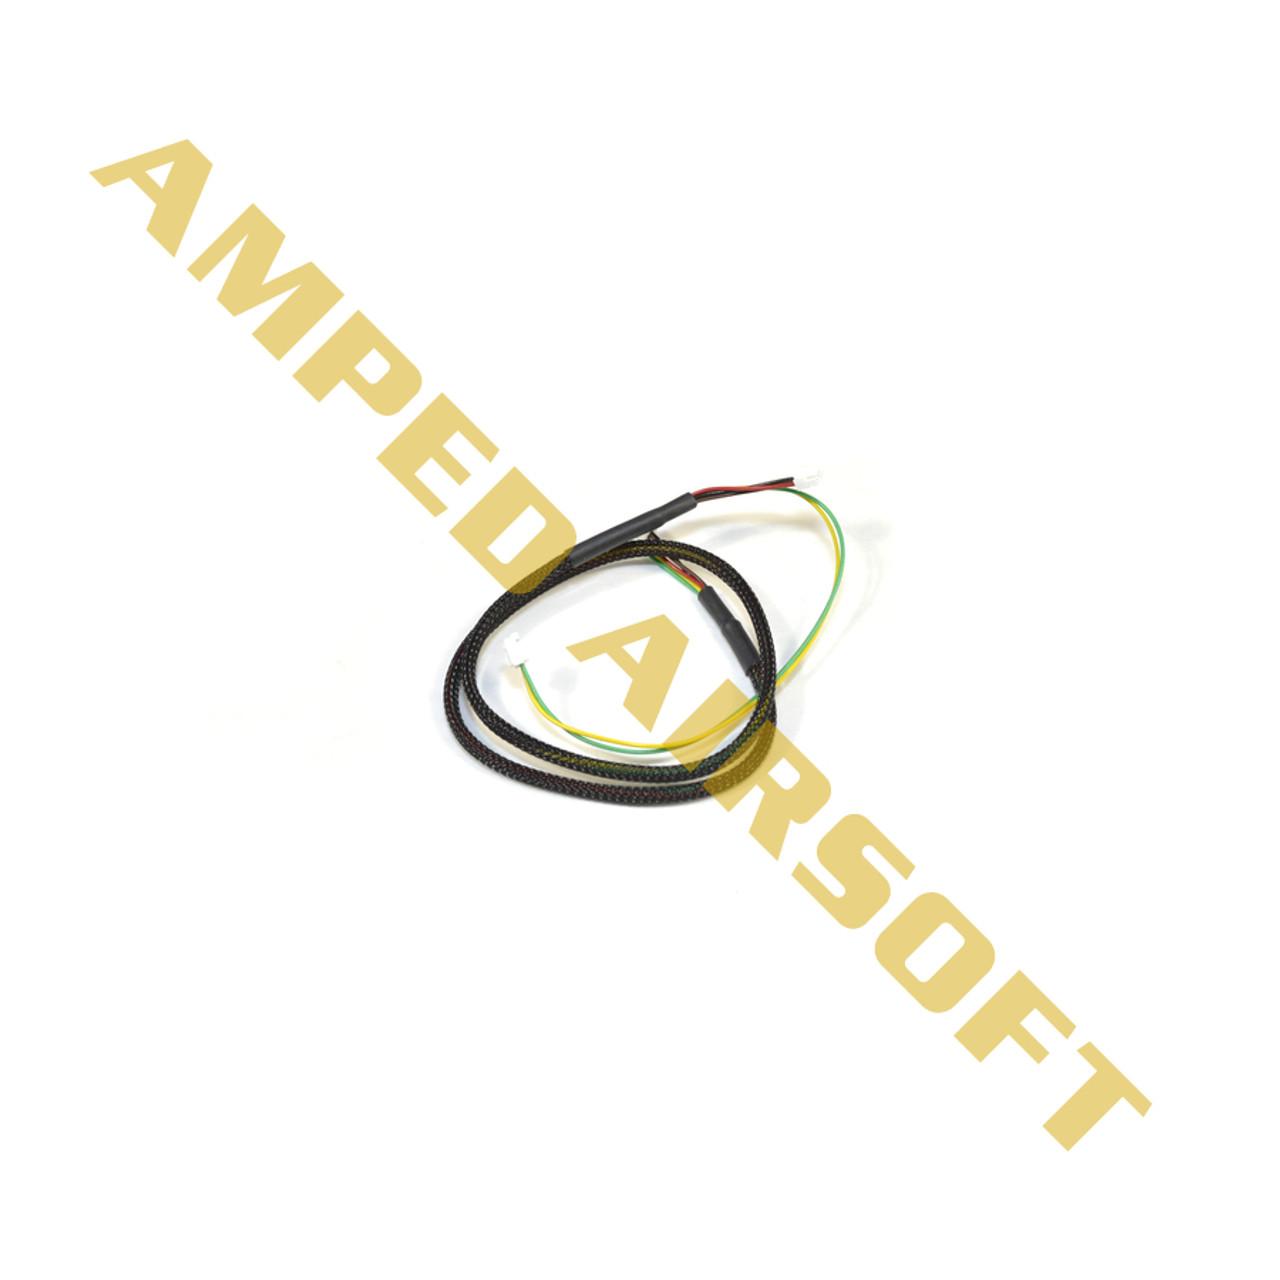 wiring wolverine airsoft v2 v3 custom 18 inch wire harness__93095.1470675338?c=2 airsoft wire harness (gen2 18\